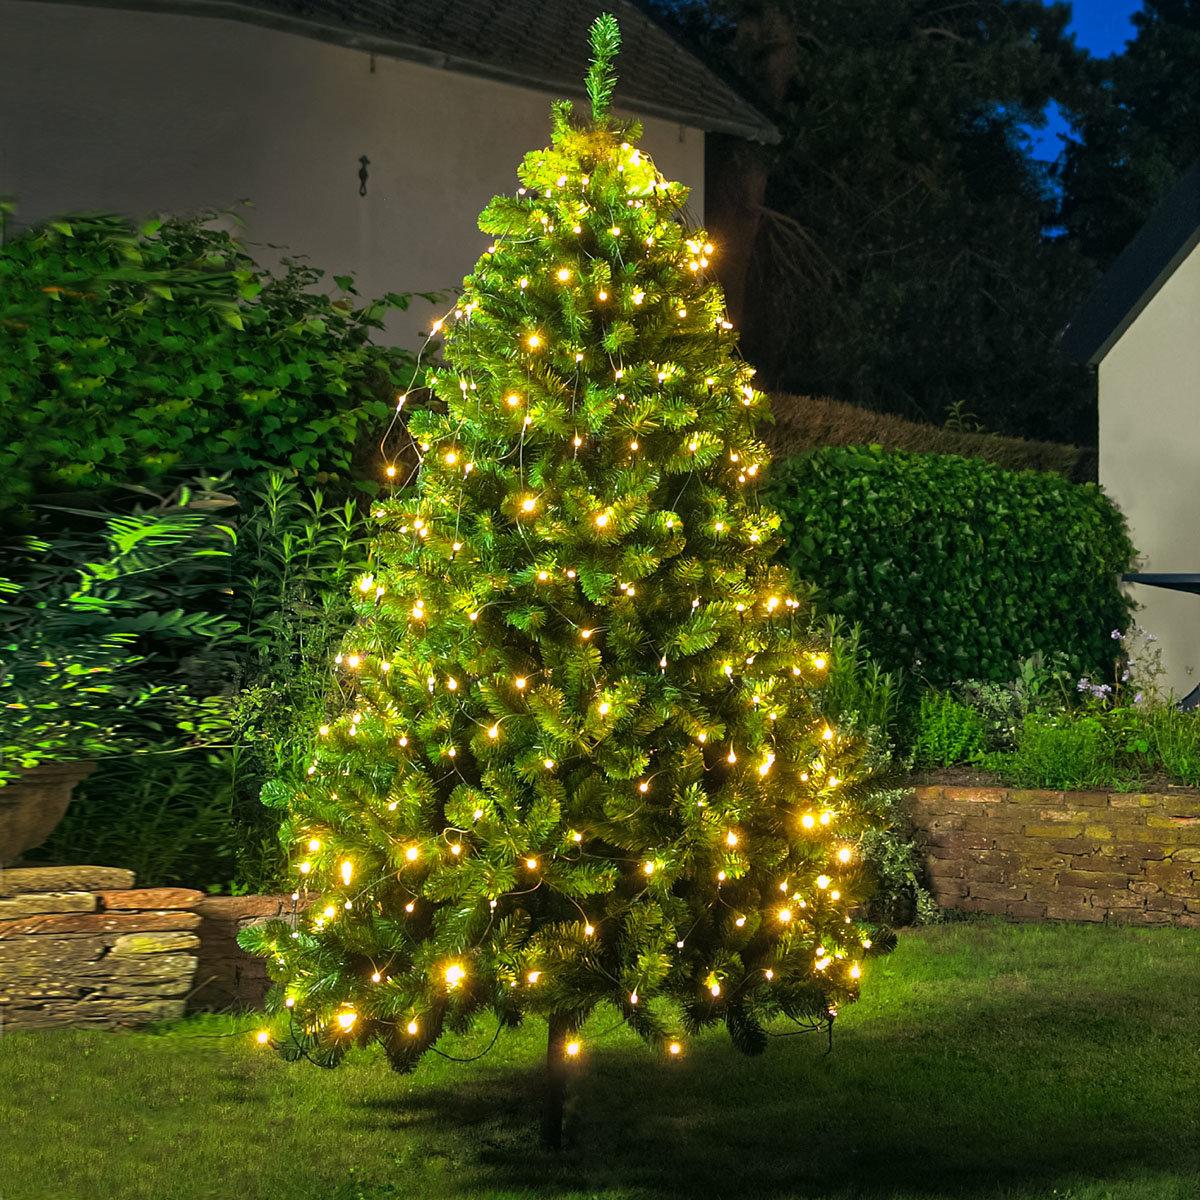 Weihnachtsbaum Netzbeleuchtung